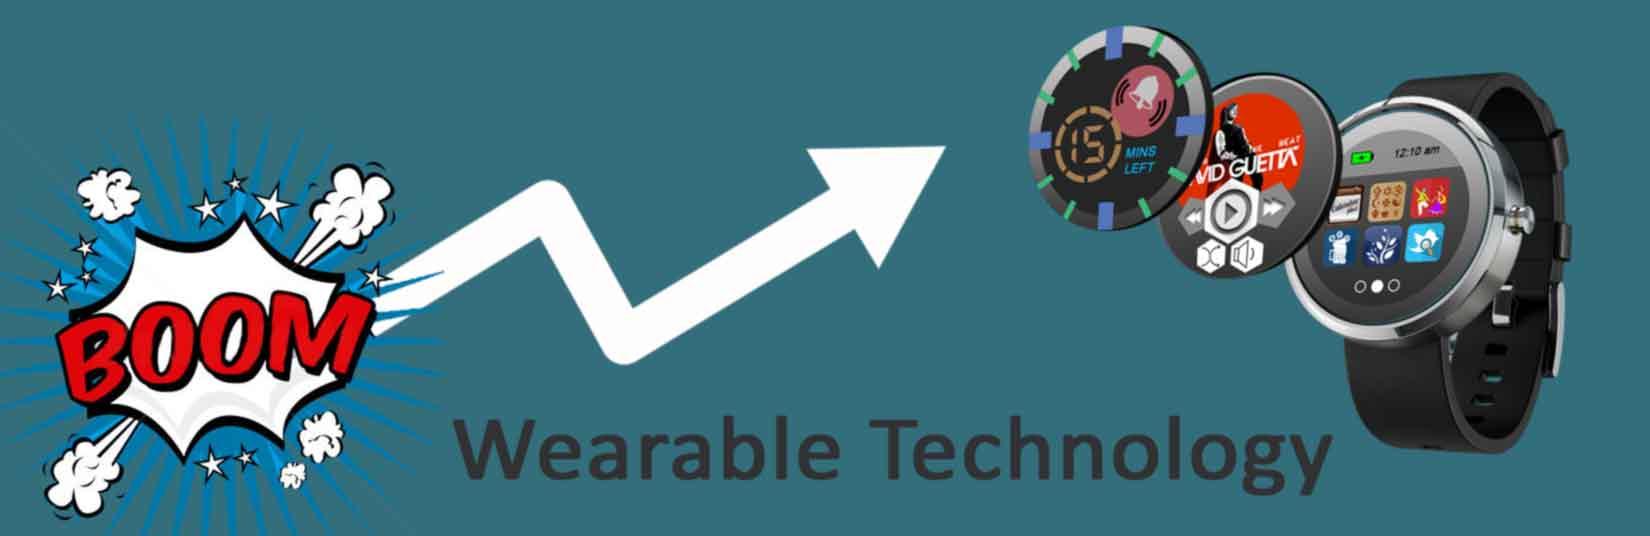 Wearable technology, Wearable technology will boom